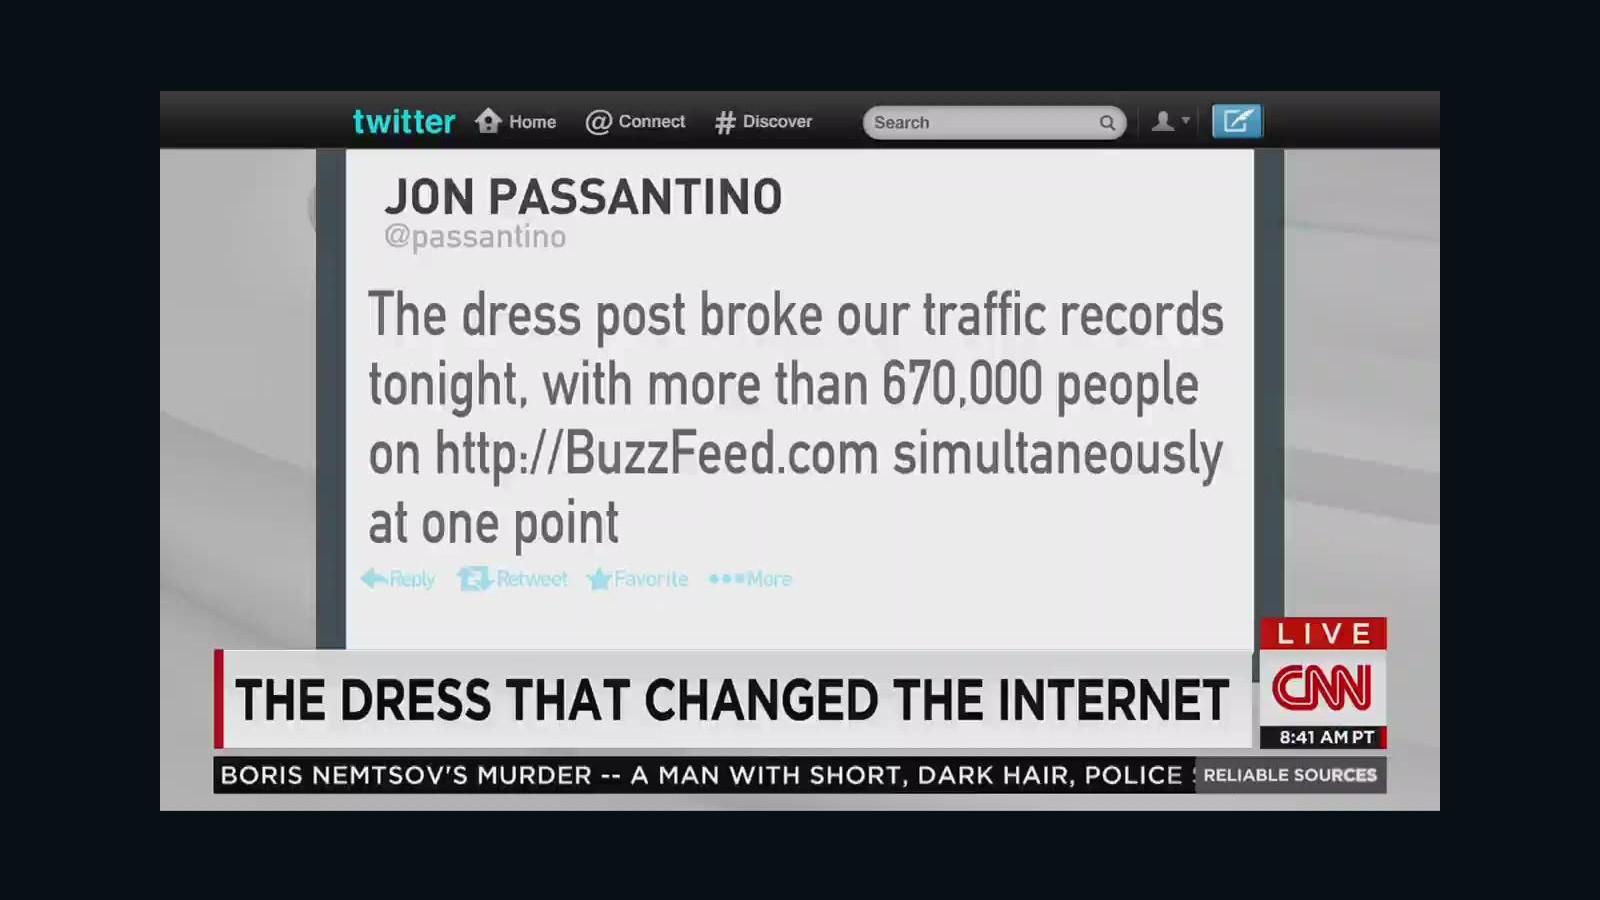 The dress broke internet - The Dress Broke Internet 49